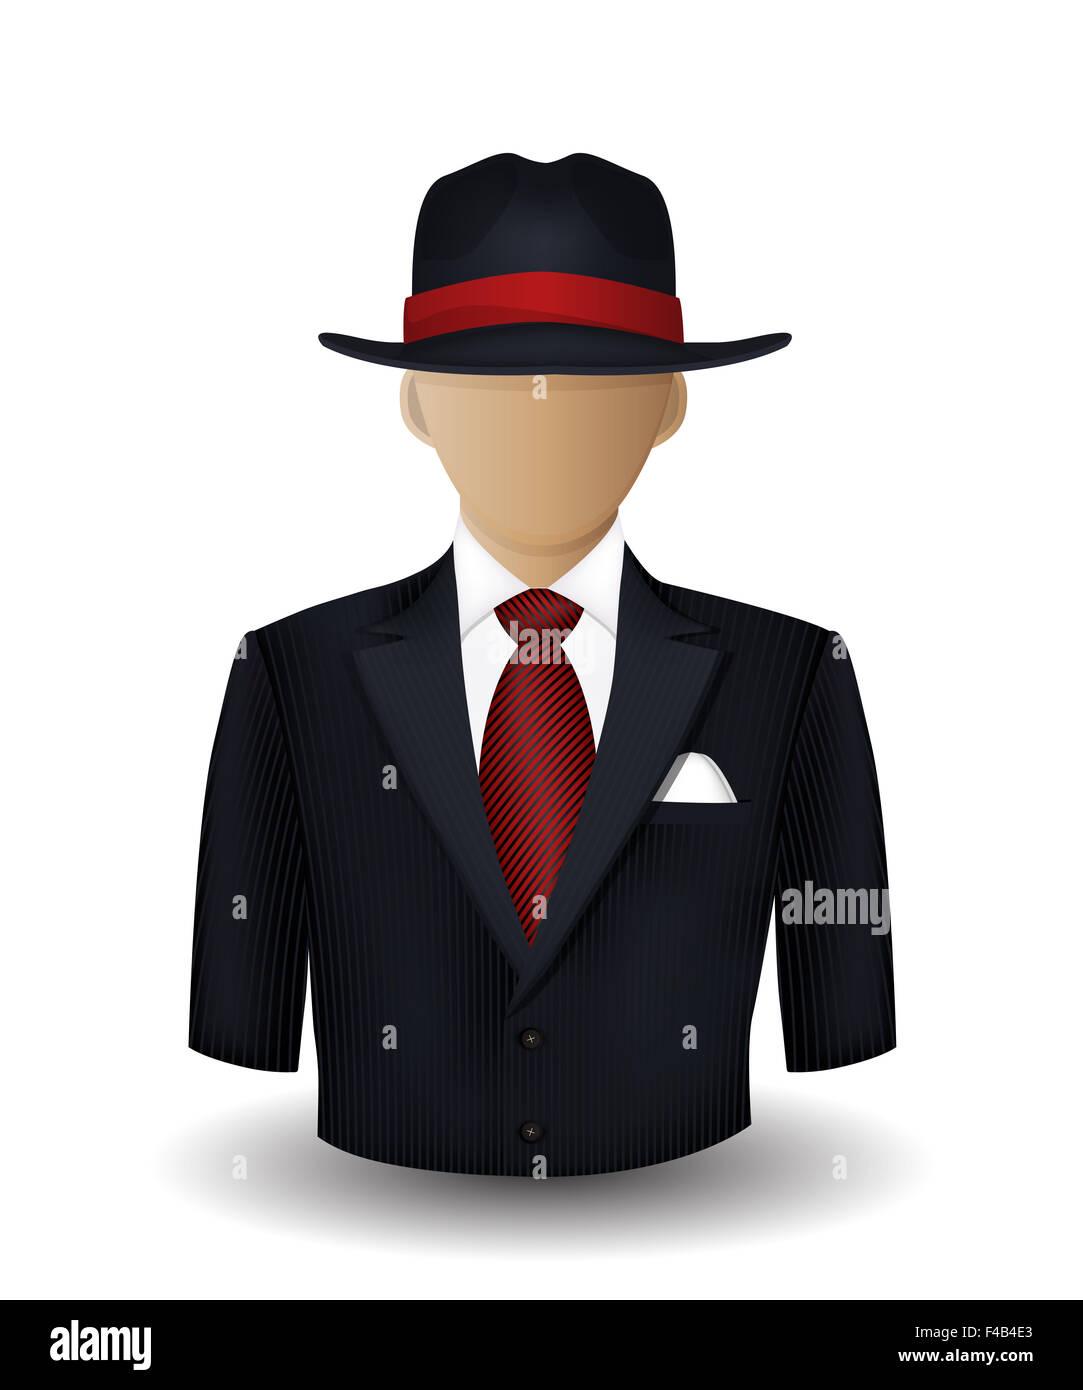 Mobster avatar - Stock Image